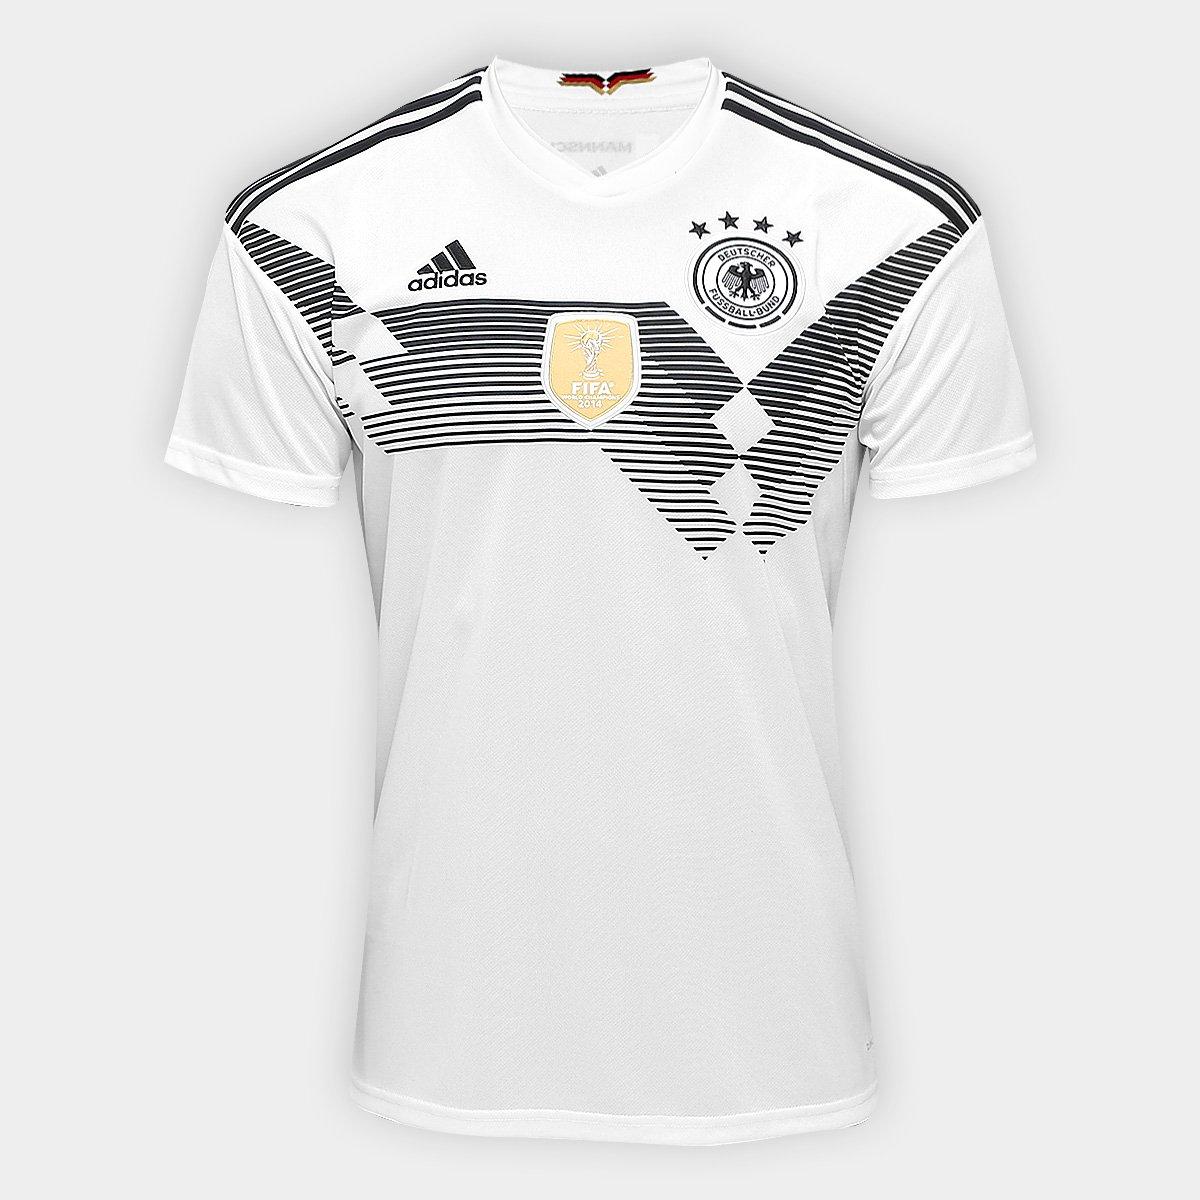 eb561a18dd ... Camisa Seleção Alemanha Home 2018 n° 21 Gündogan - Torcedor Adidas  Masculina ...